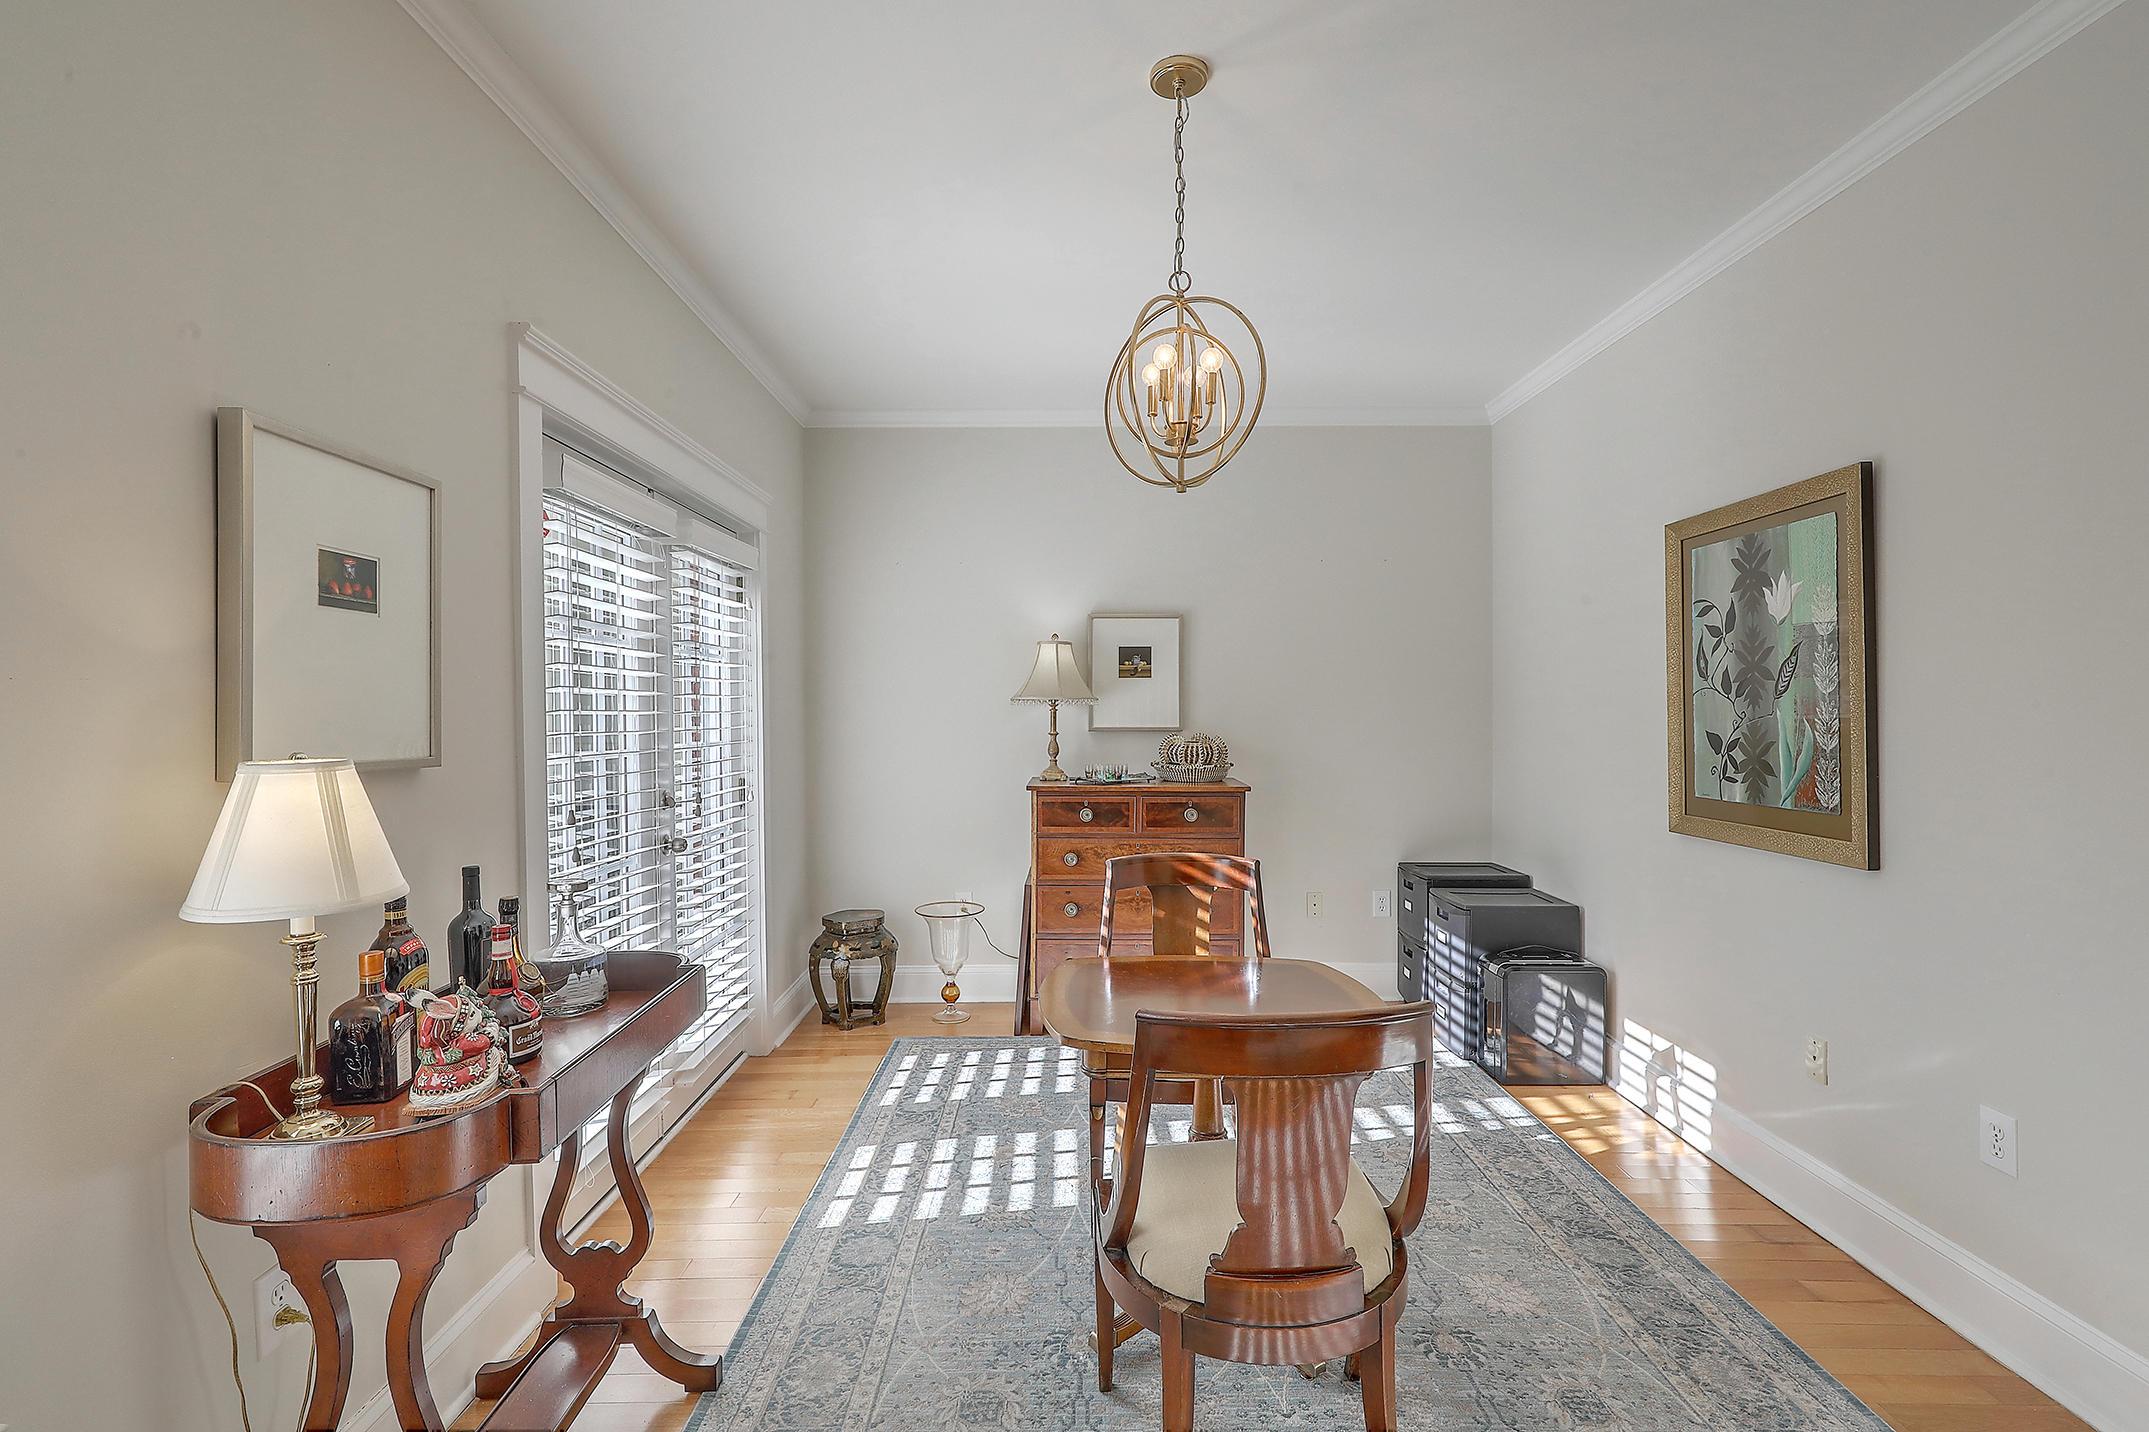 Etiwan Pointe Homes For Sale - 124 Winding Creek, Mount Pleasant, SC - 20